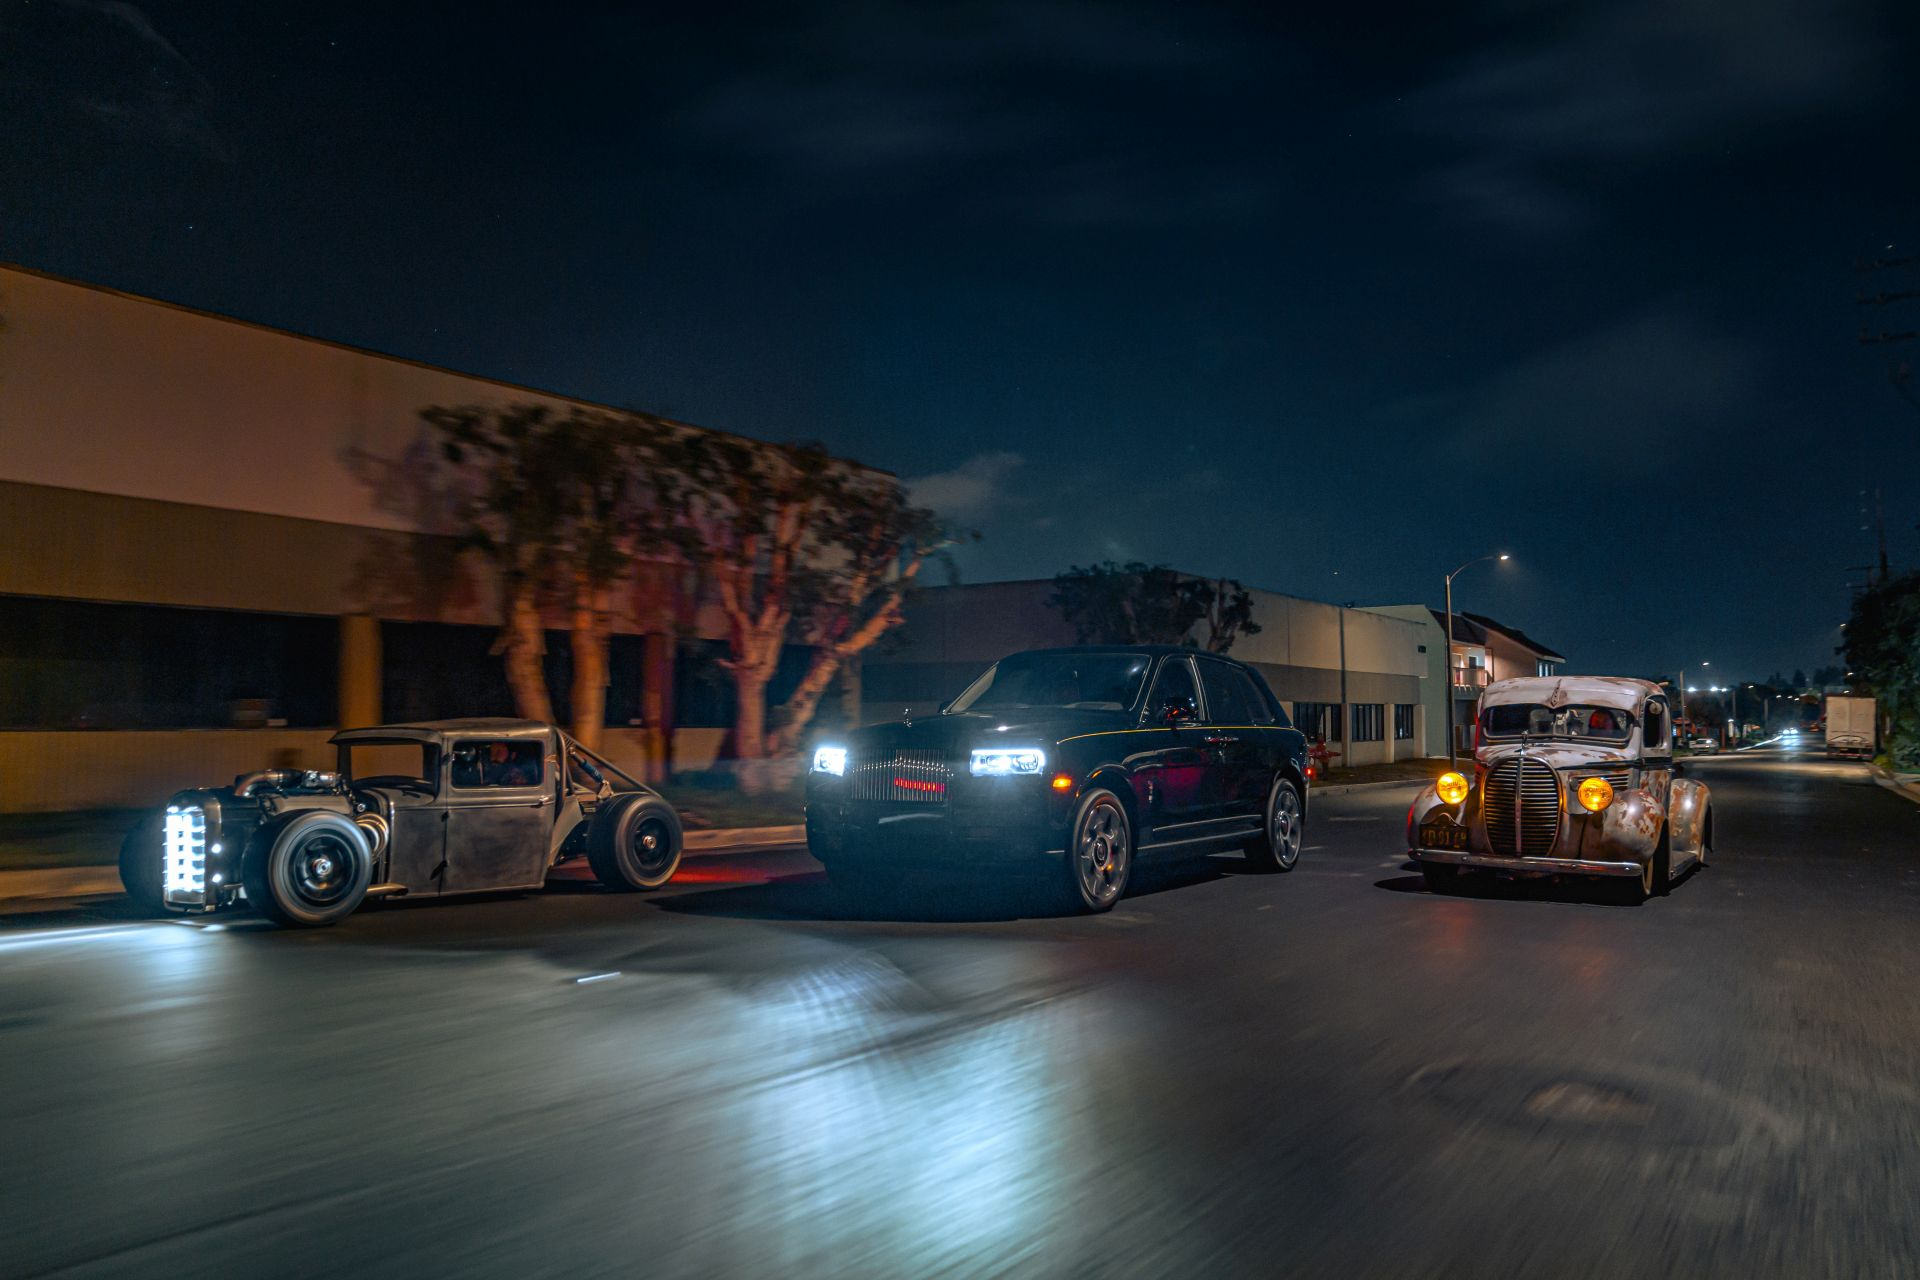 Rolls Royce Cullinan Black Badge King of the Night 13